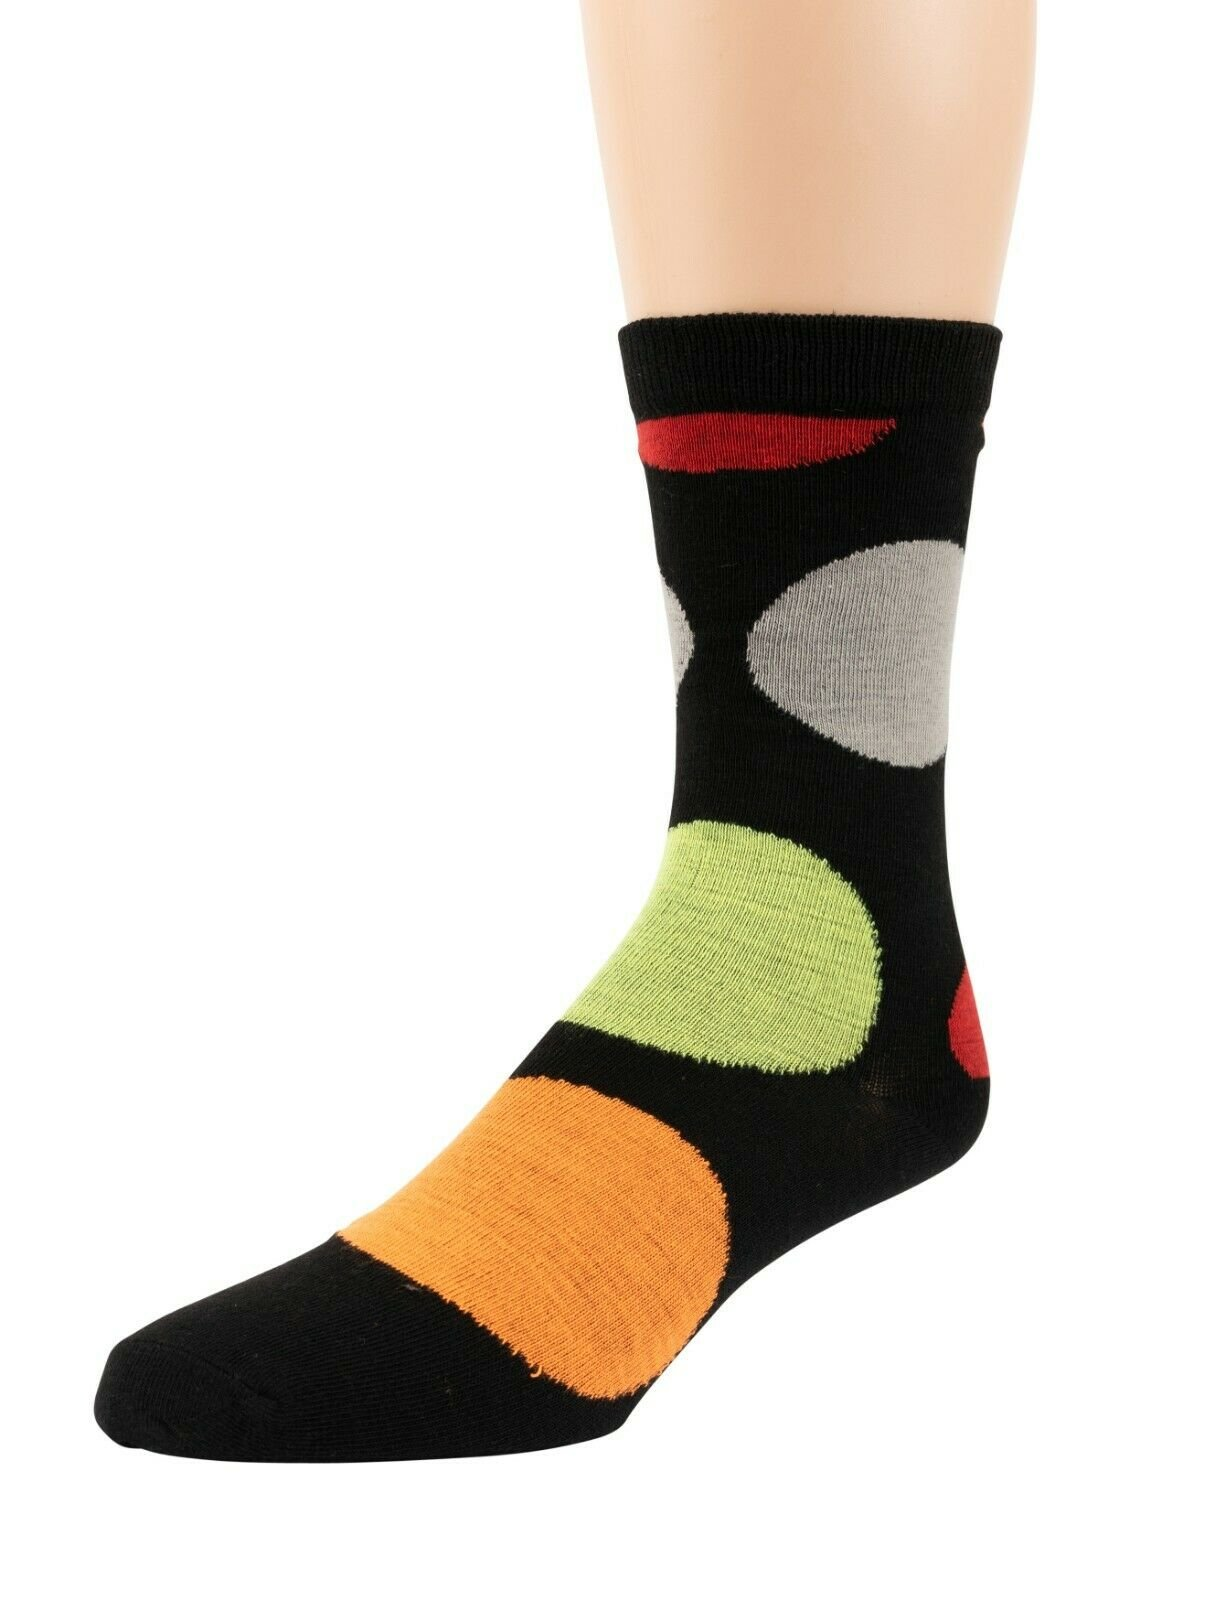 Mitch-Bogen-Mens-Cotton-Dress-Socks-Colorful-Fashion-Crew-Socks-8-Pack-Gift-Box thumbnail 20